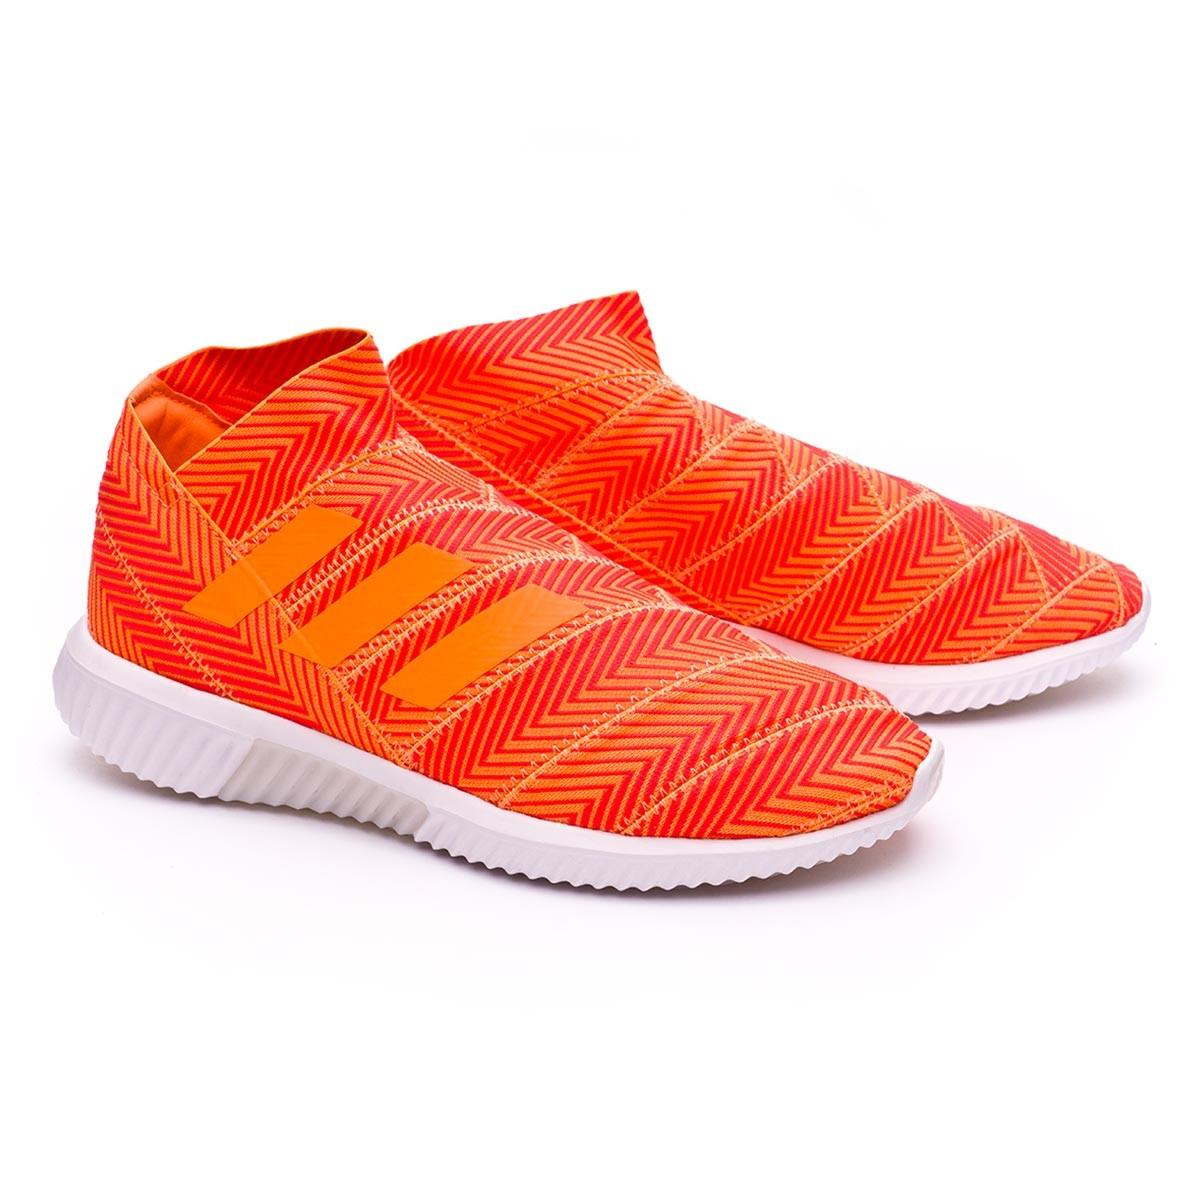 f1d68e7cd Trainers adidas Nemeziz Tango 18.1 TR Zest-Black - Football store ...